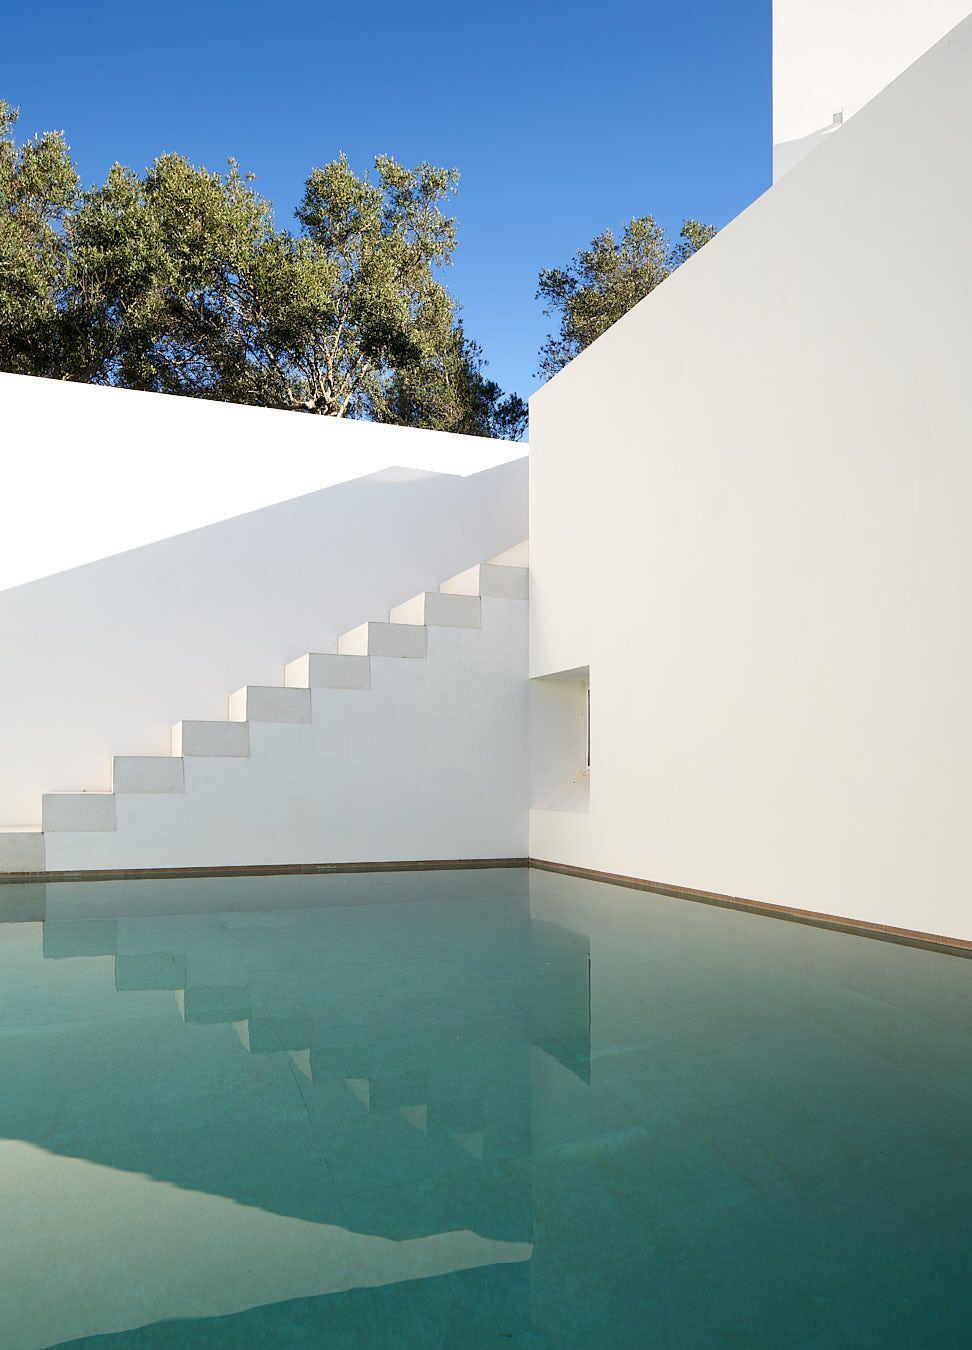 Zalig-Algarve-Casa-Luum-195-1